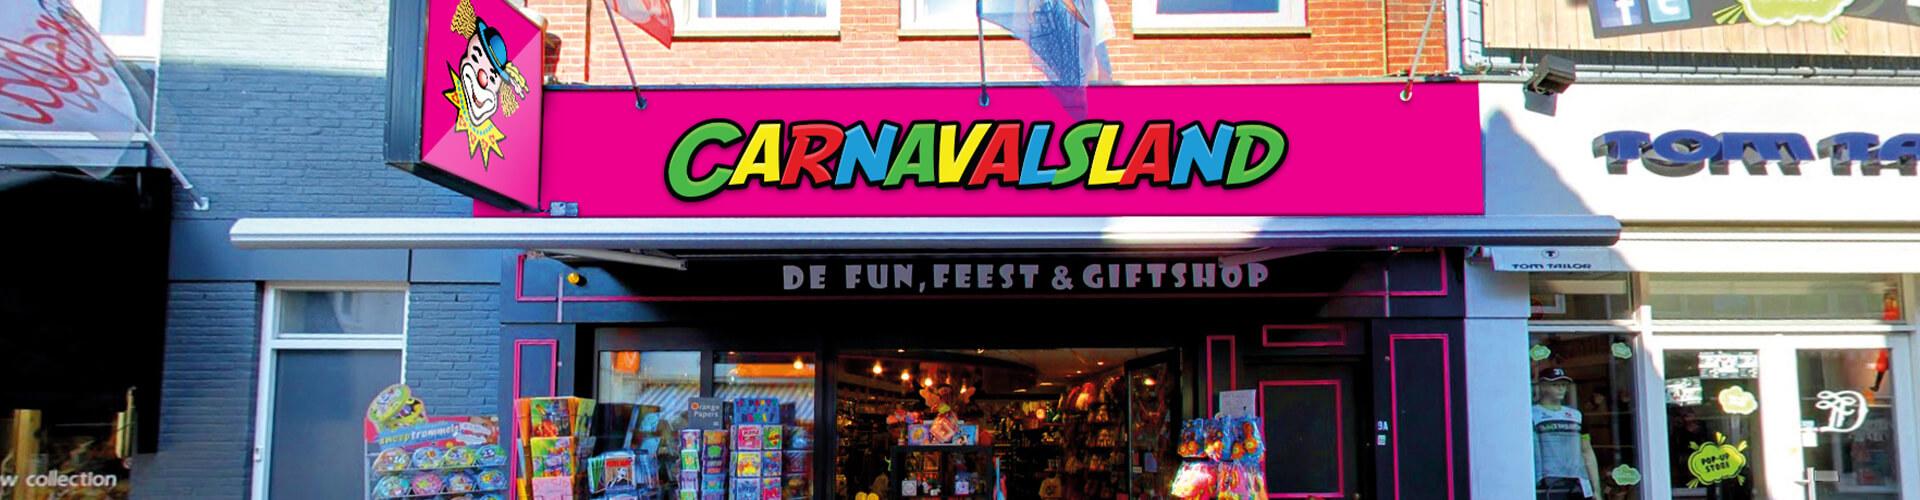 Carnavalsland Feestwinkel Oldenzaal